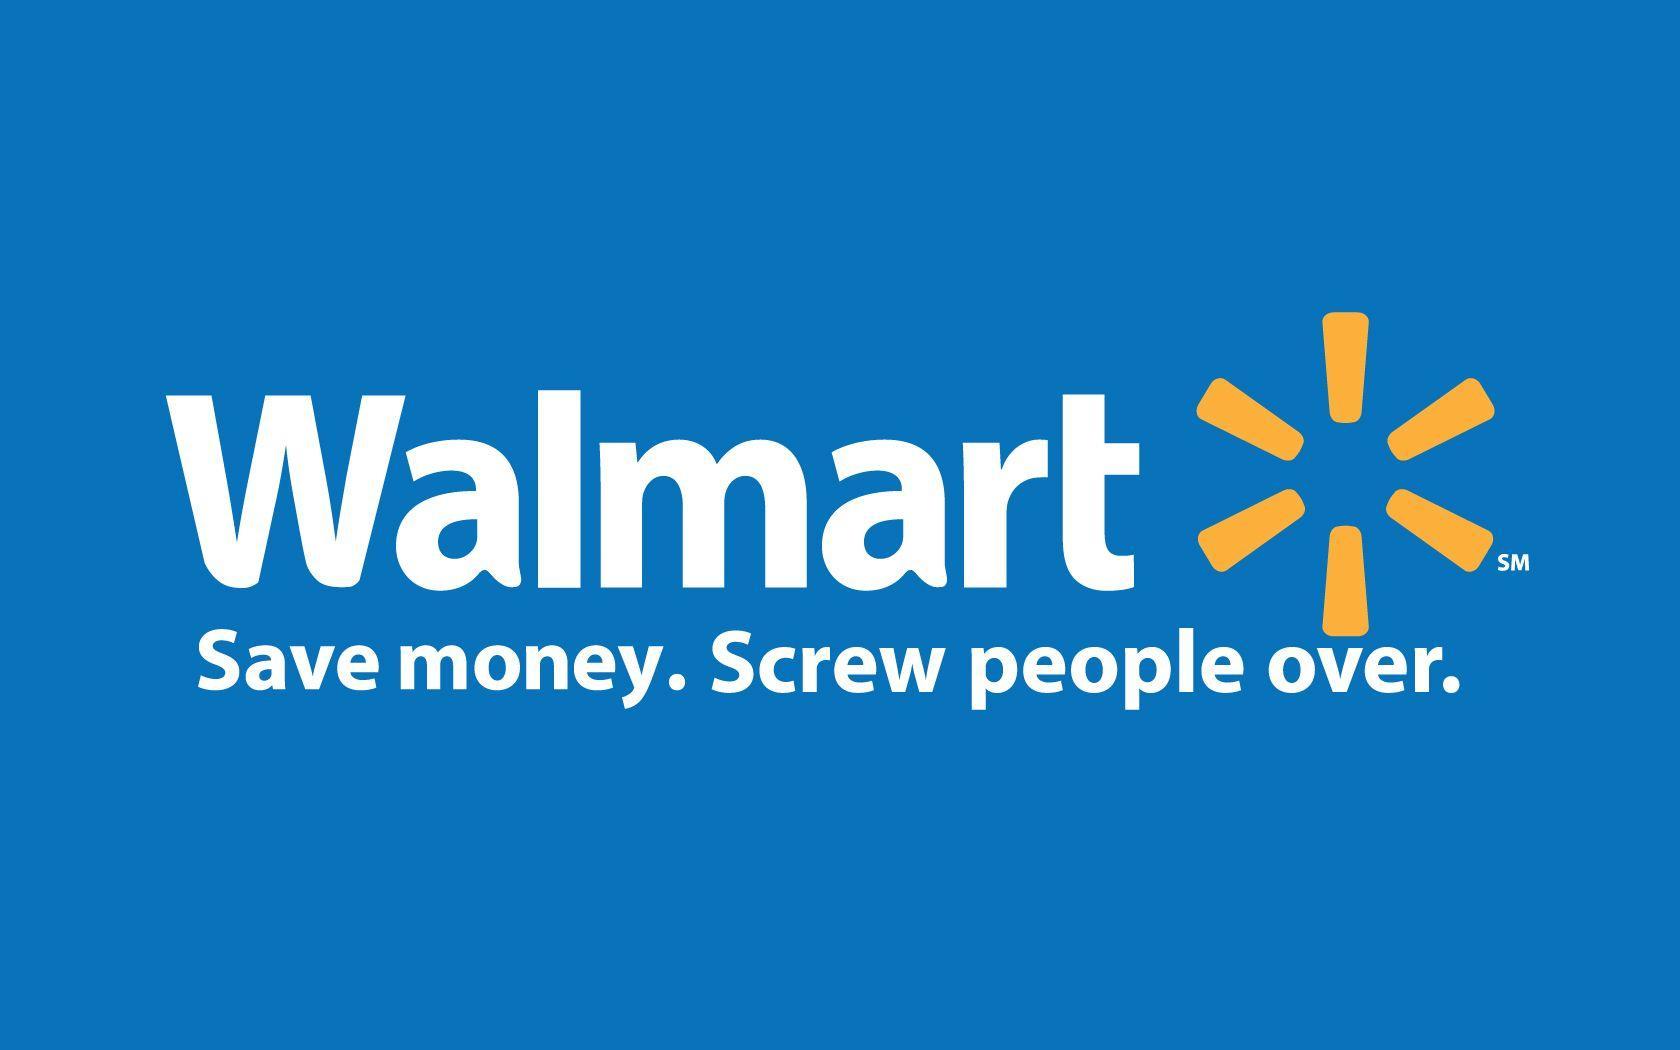 Walmart Wallpapers Wallpaper Cave